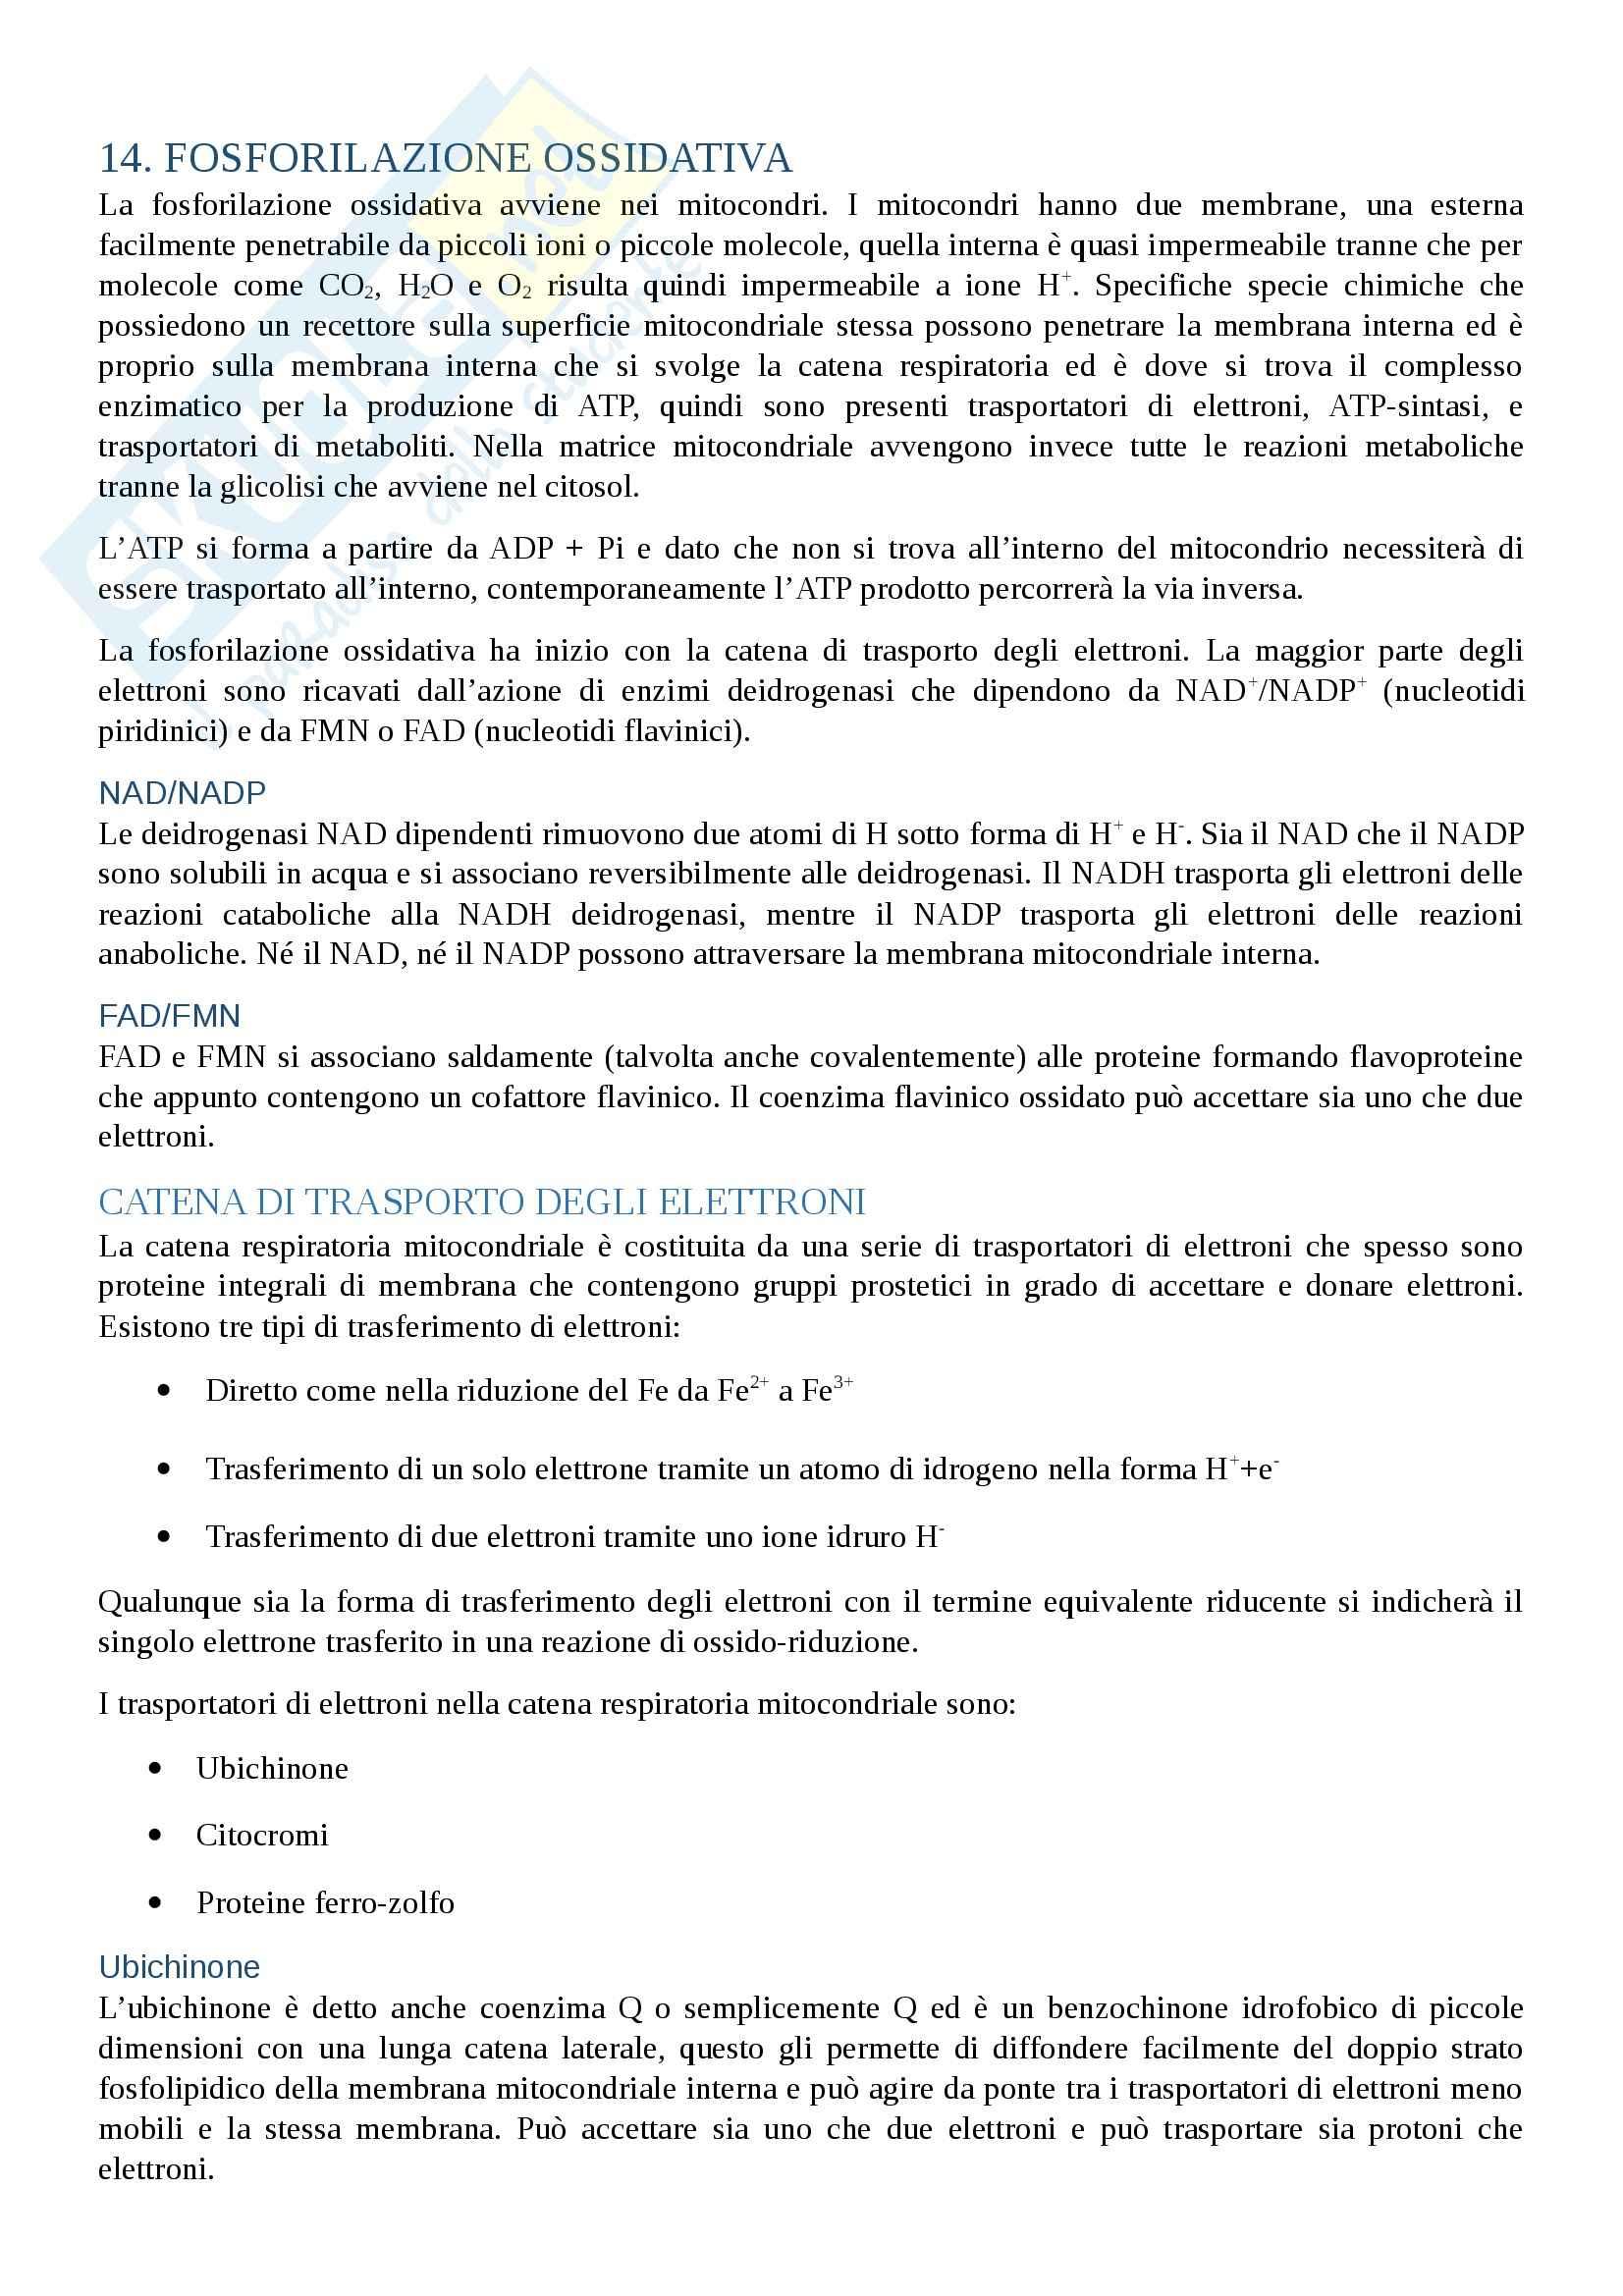 Biochimica - fosforilazione ossidativa